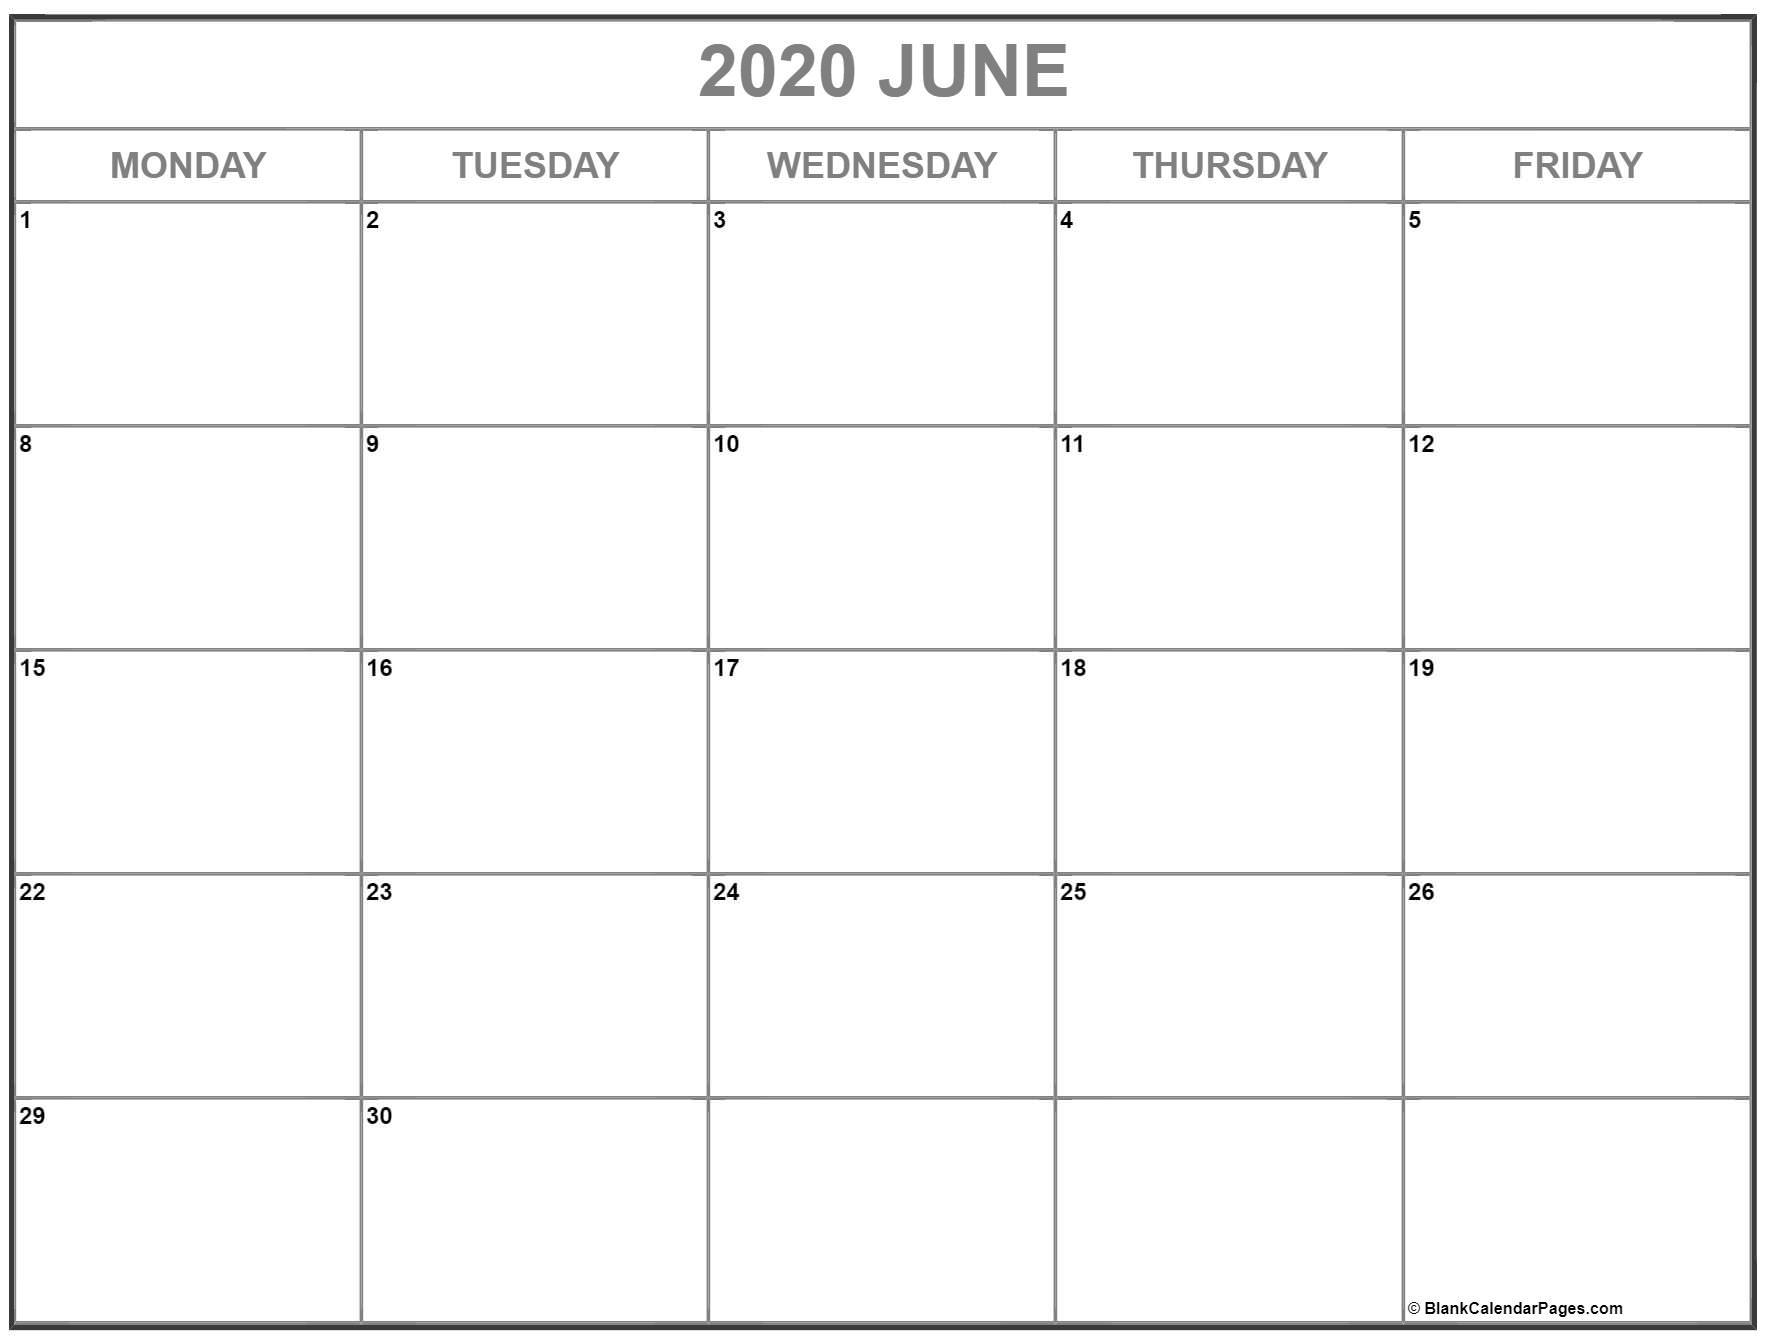 June 2020 Monday Calendar | Monday To Sunday pertaining to Monday Thru Friday Schedule Template